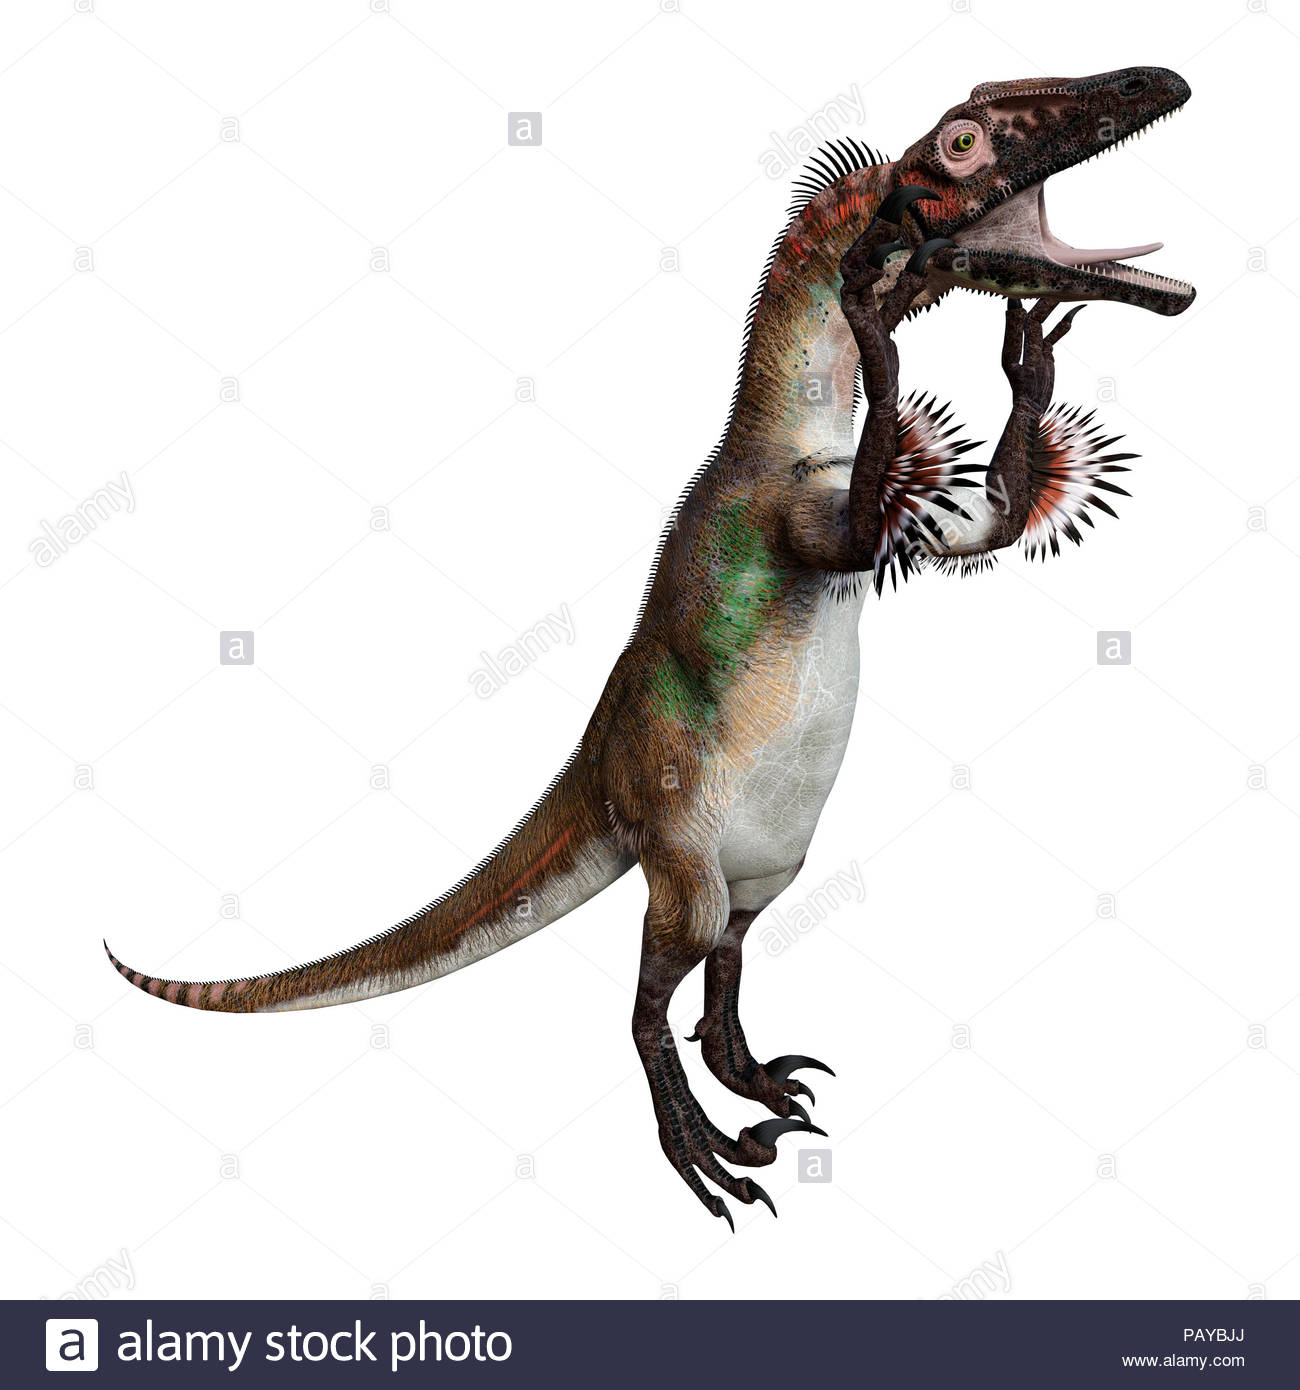 3D rendering of a dinosaur utahraptor isolated on white background 1300x1390